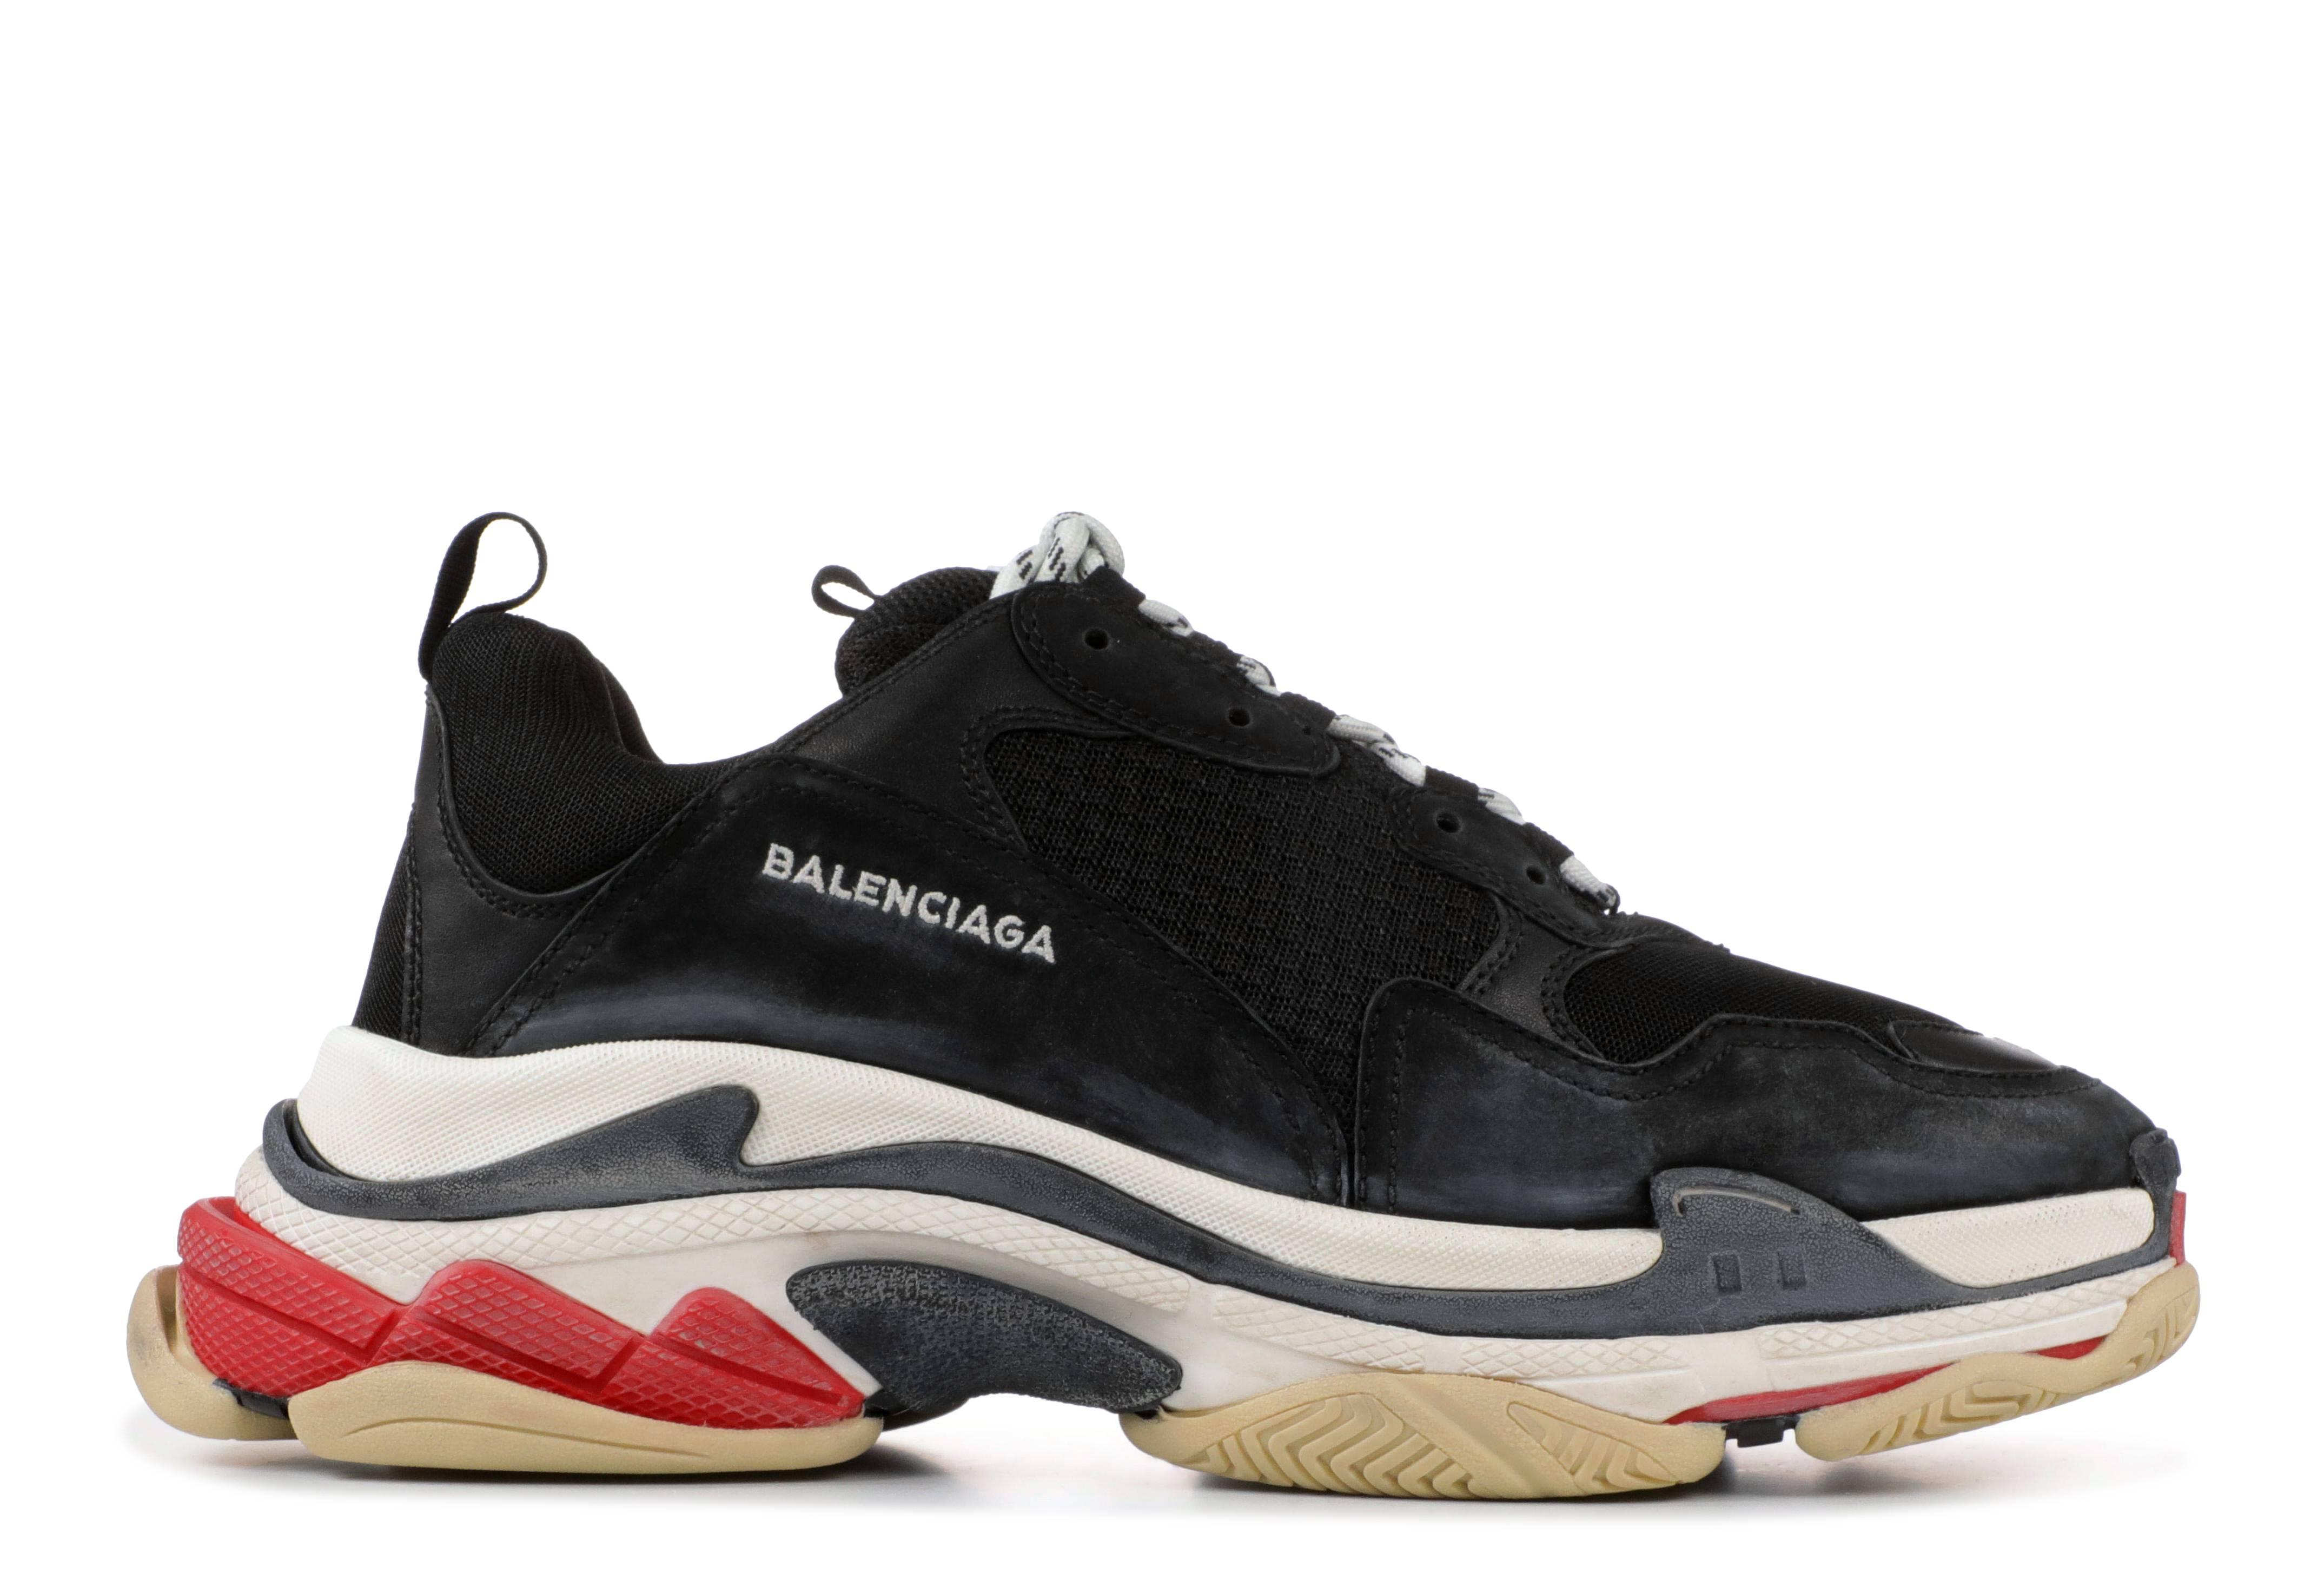 67ce48ce6f6a2 Balenciaga Sneakers - Triple S Low Tops